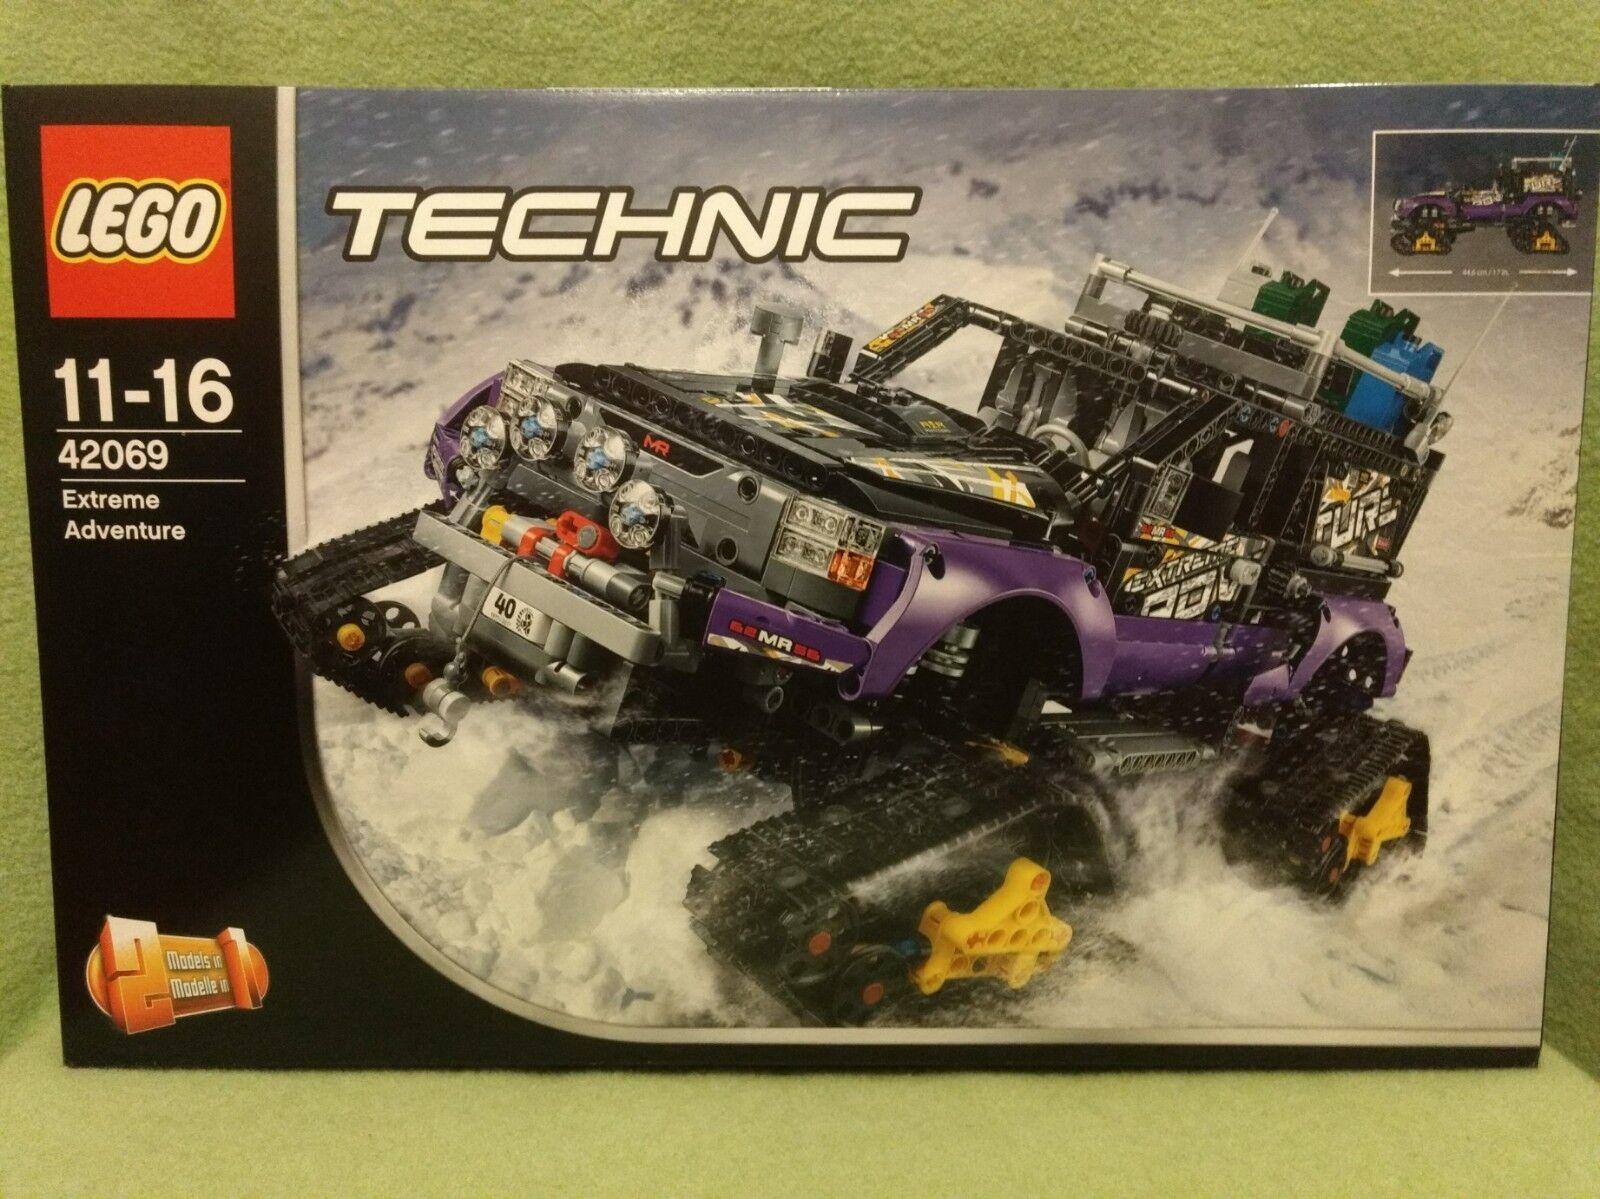 LEGO Technic Extremgeländefahrzeug (42069), neu, OVP, ungeöffnet